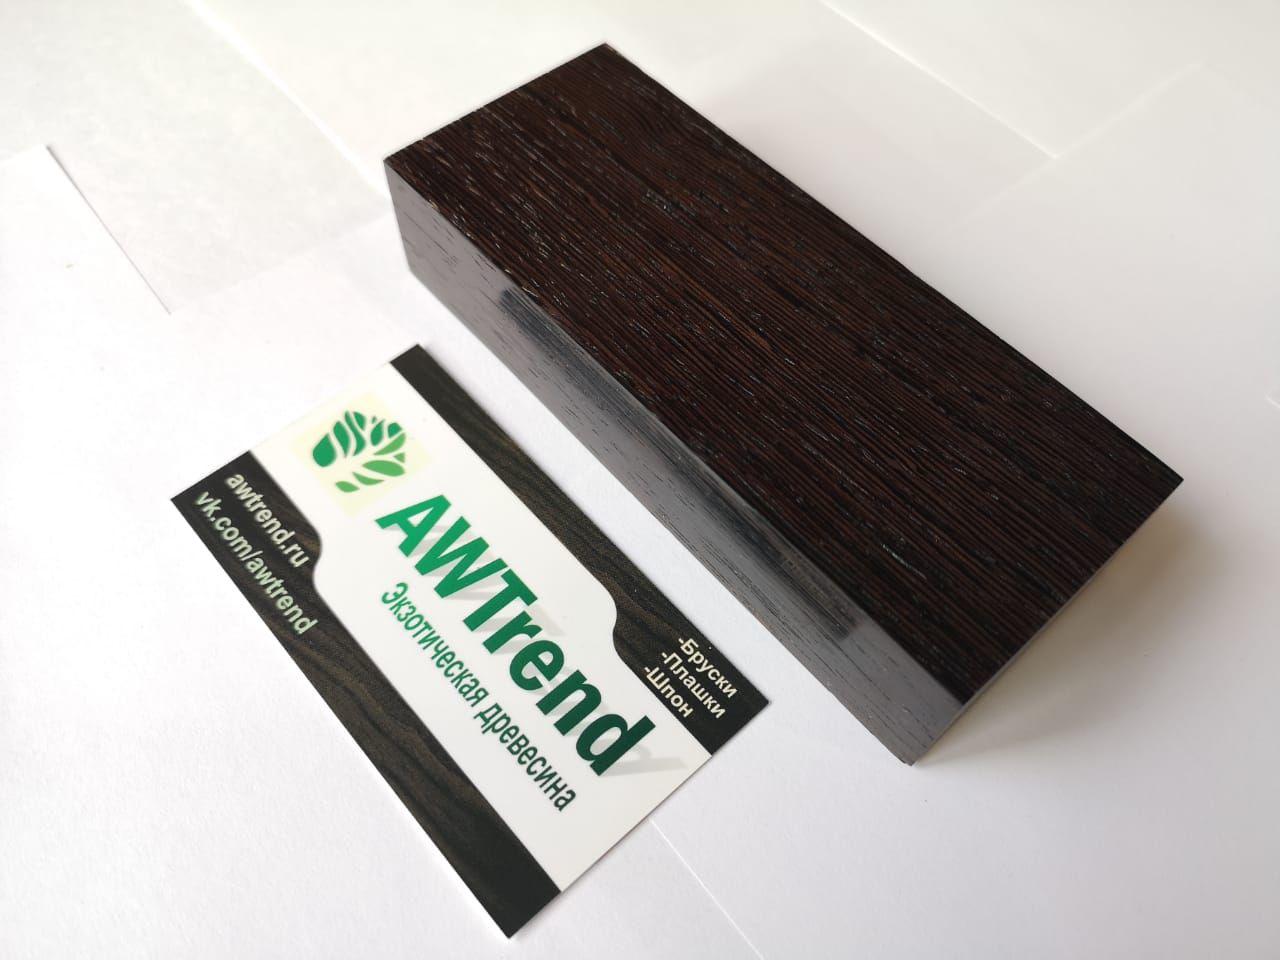 Венге (Wenge) плашки 260-400 мм (цена за 1 шт)